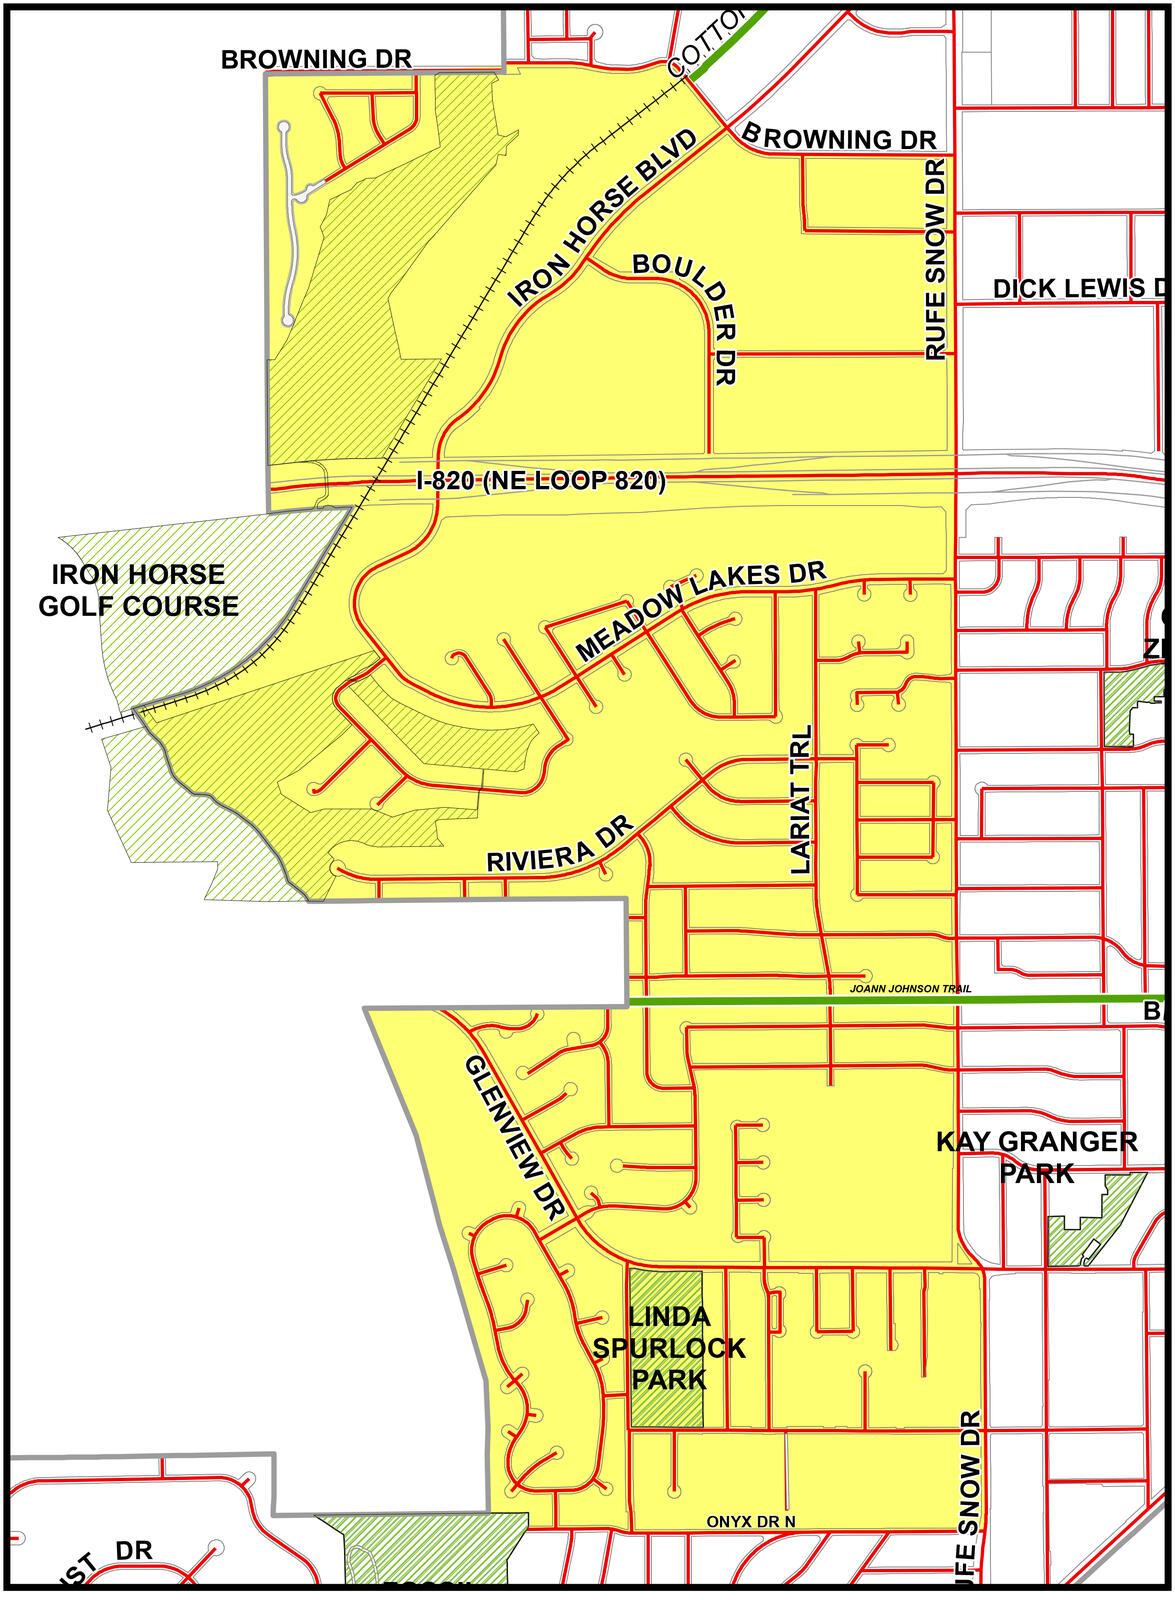 Home Health Agencies In North Richland Hills Tx